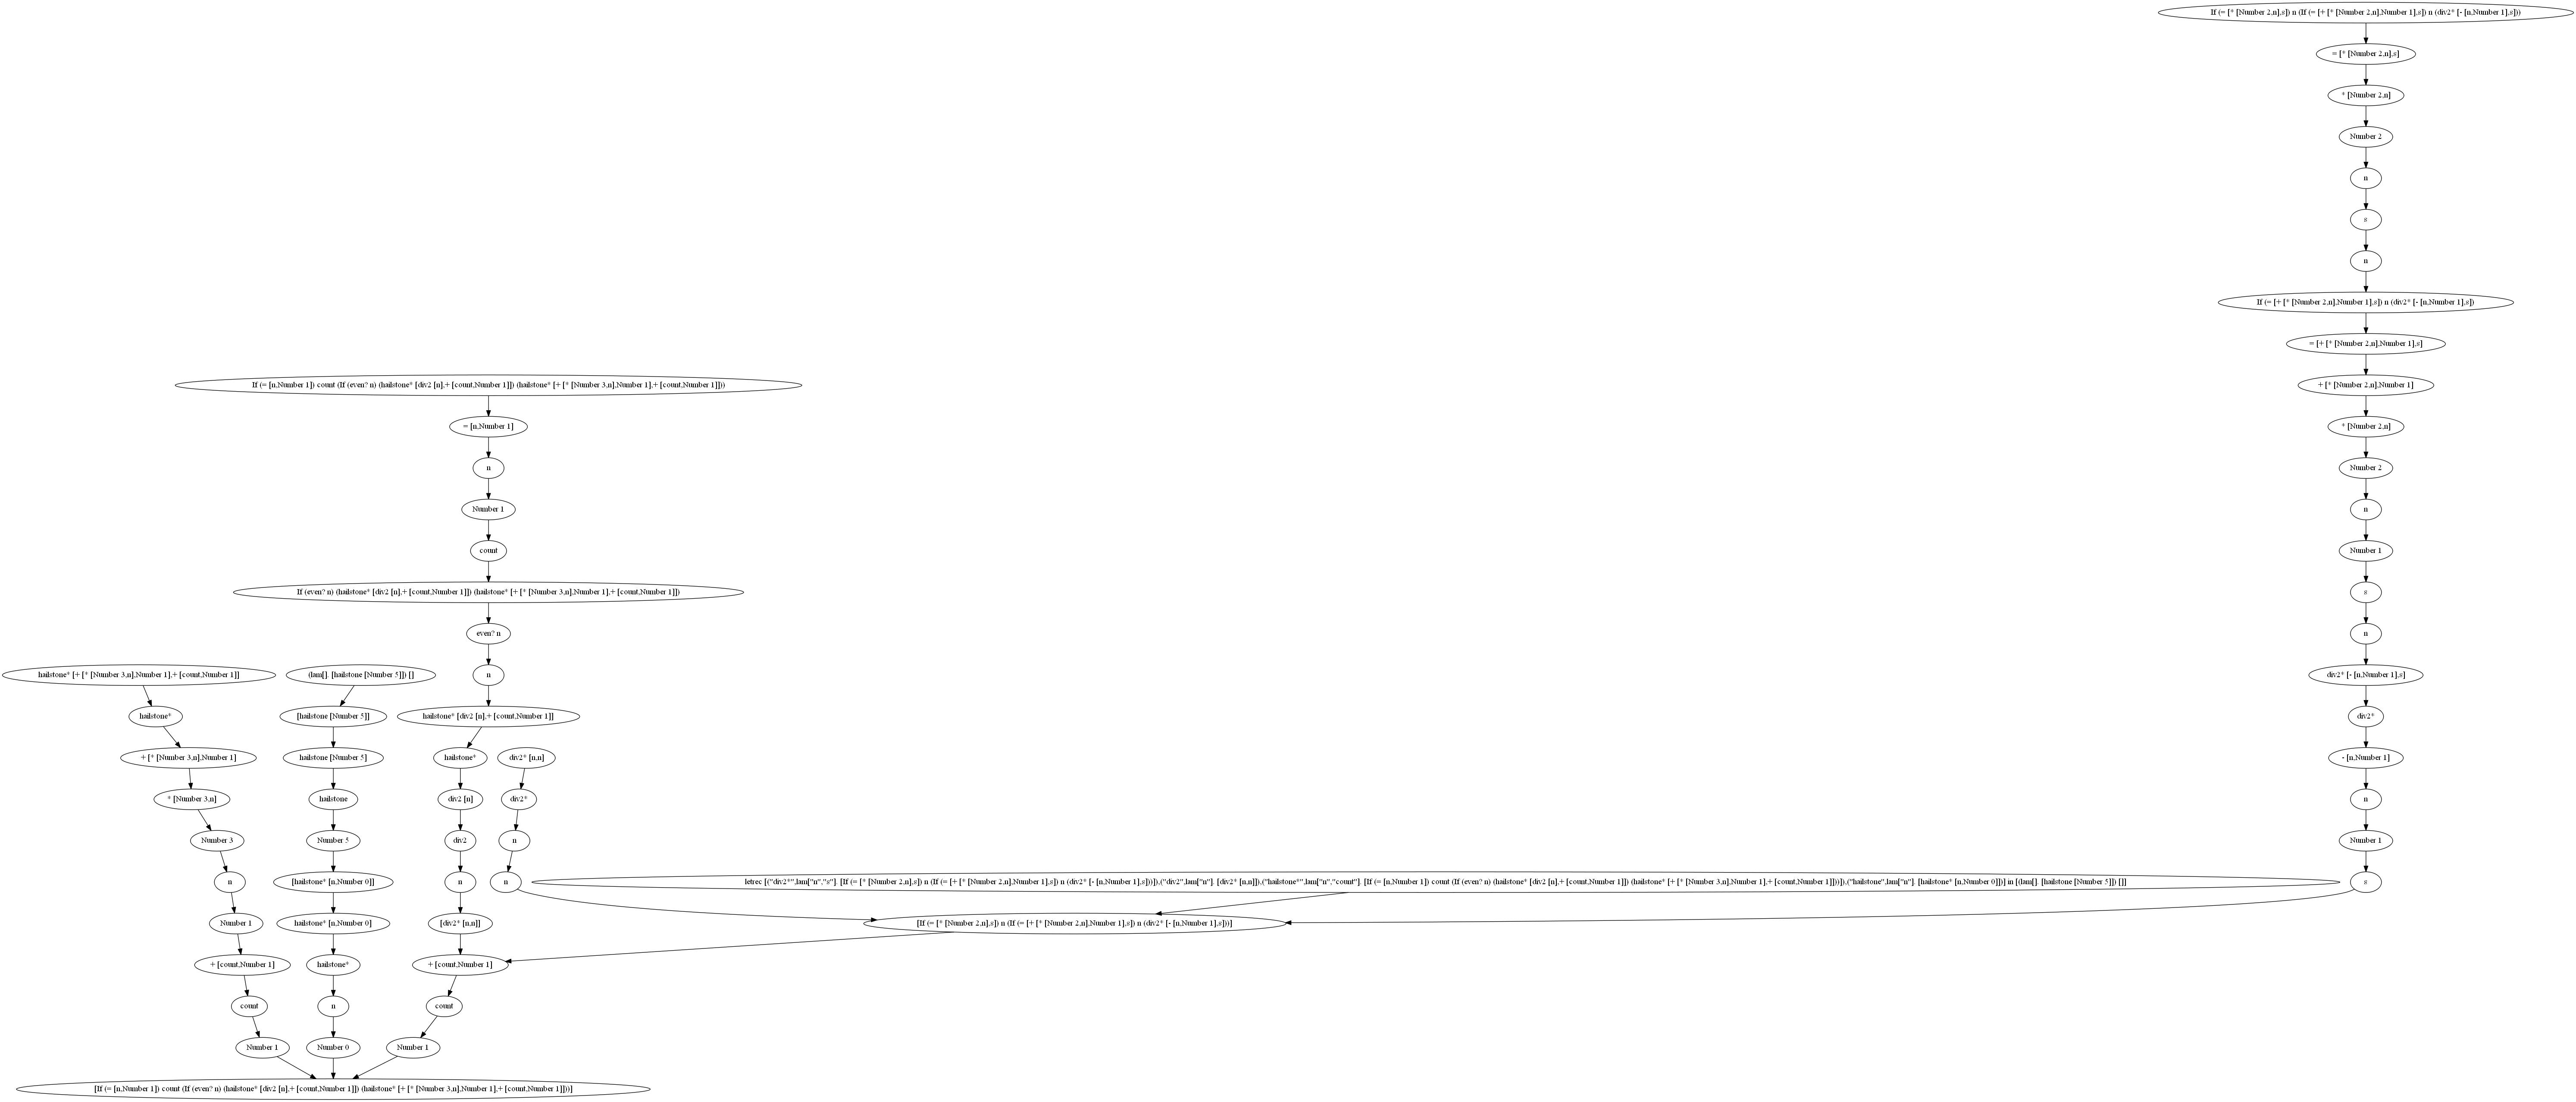 scheme/graph_files/scala-am/collatz.png